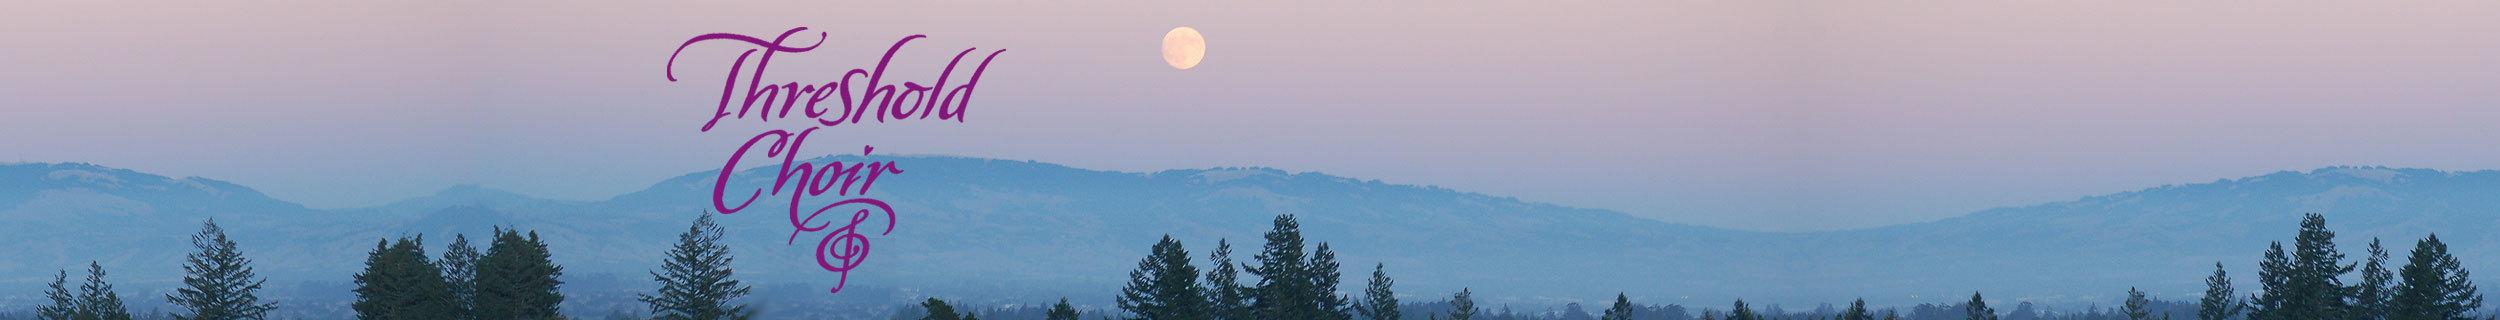 Threshold choir full moon